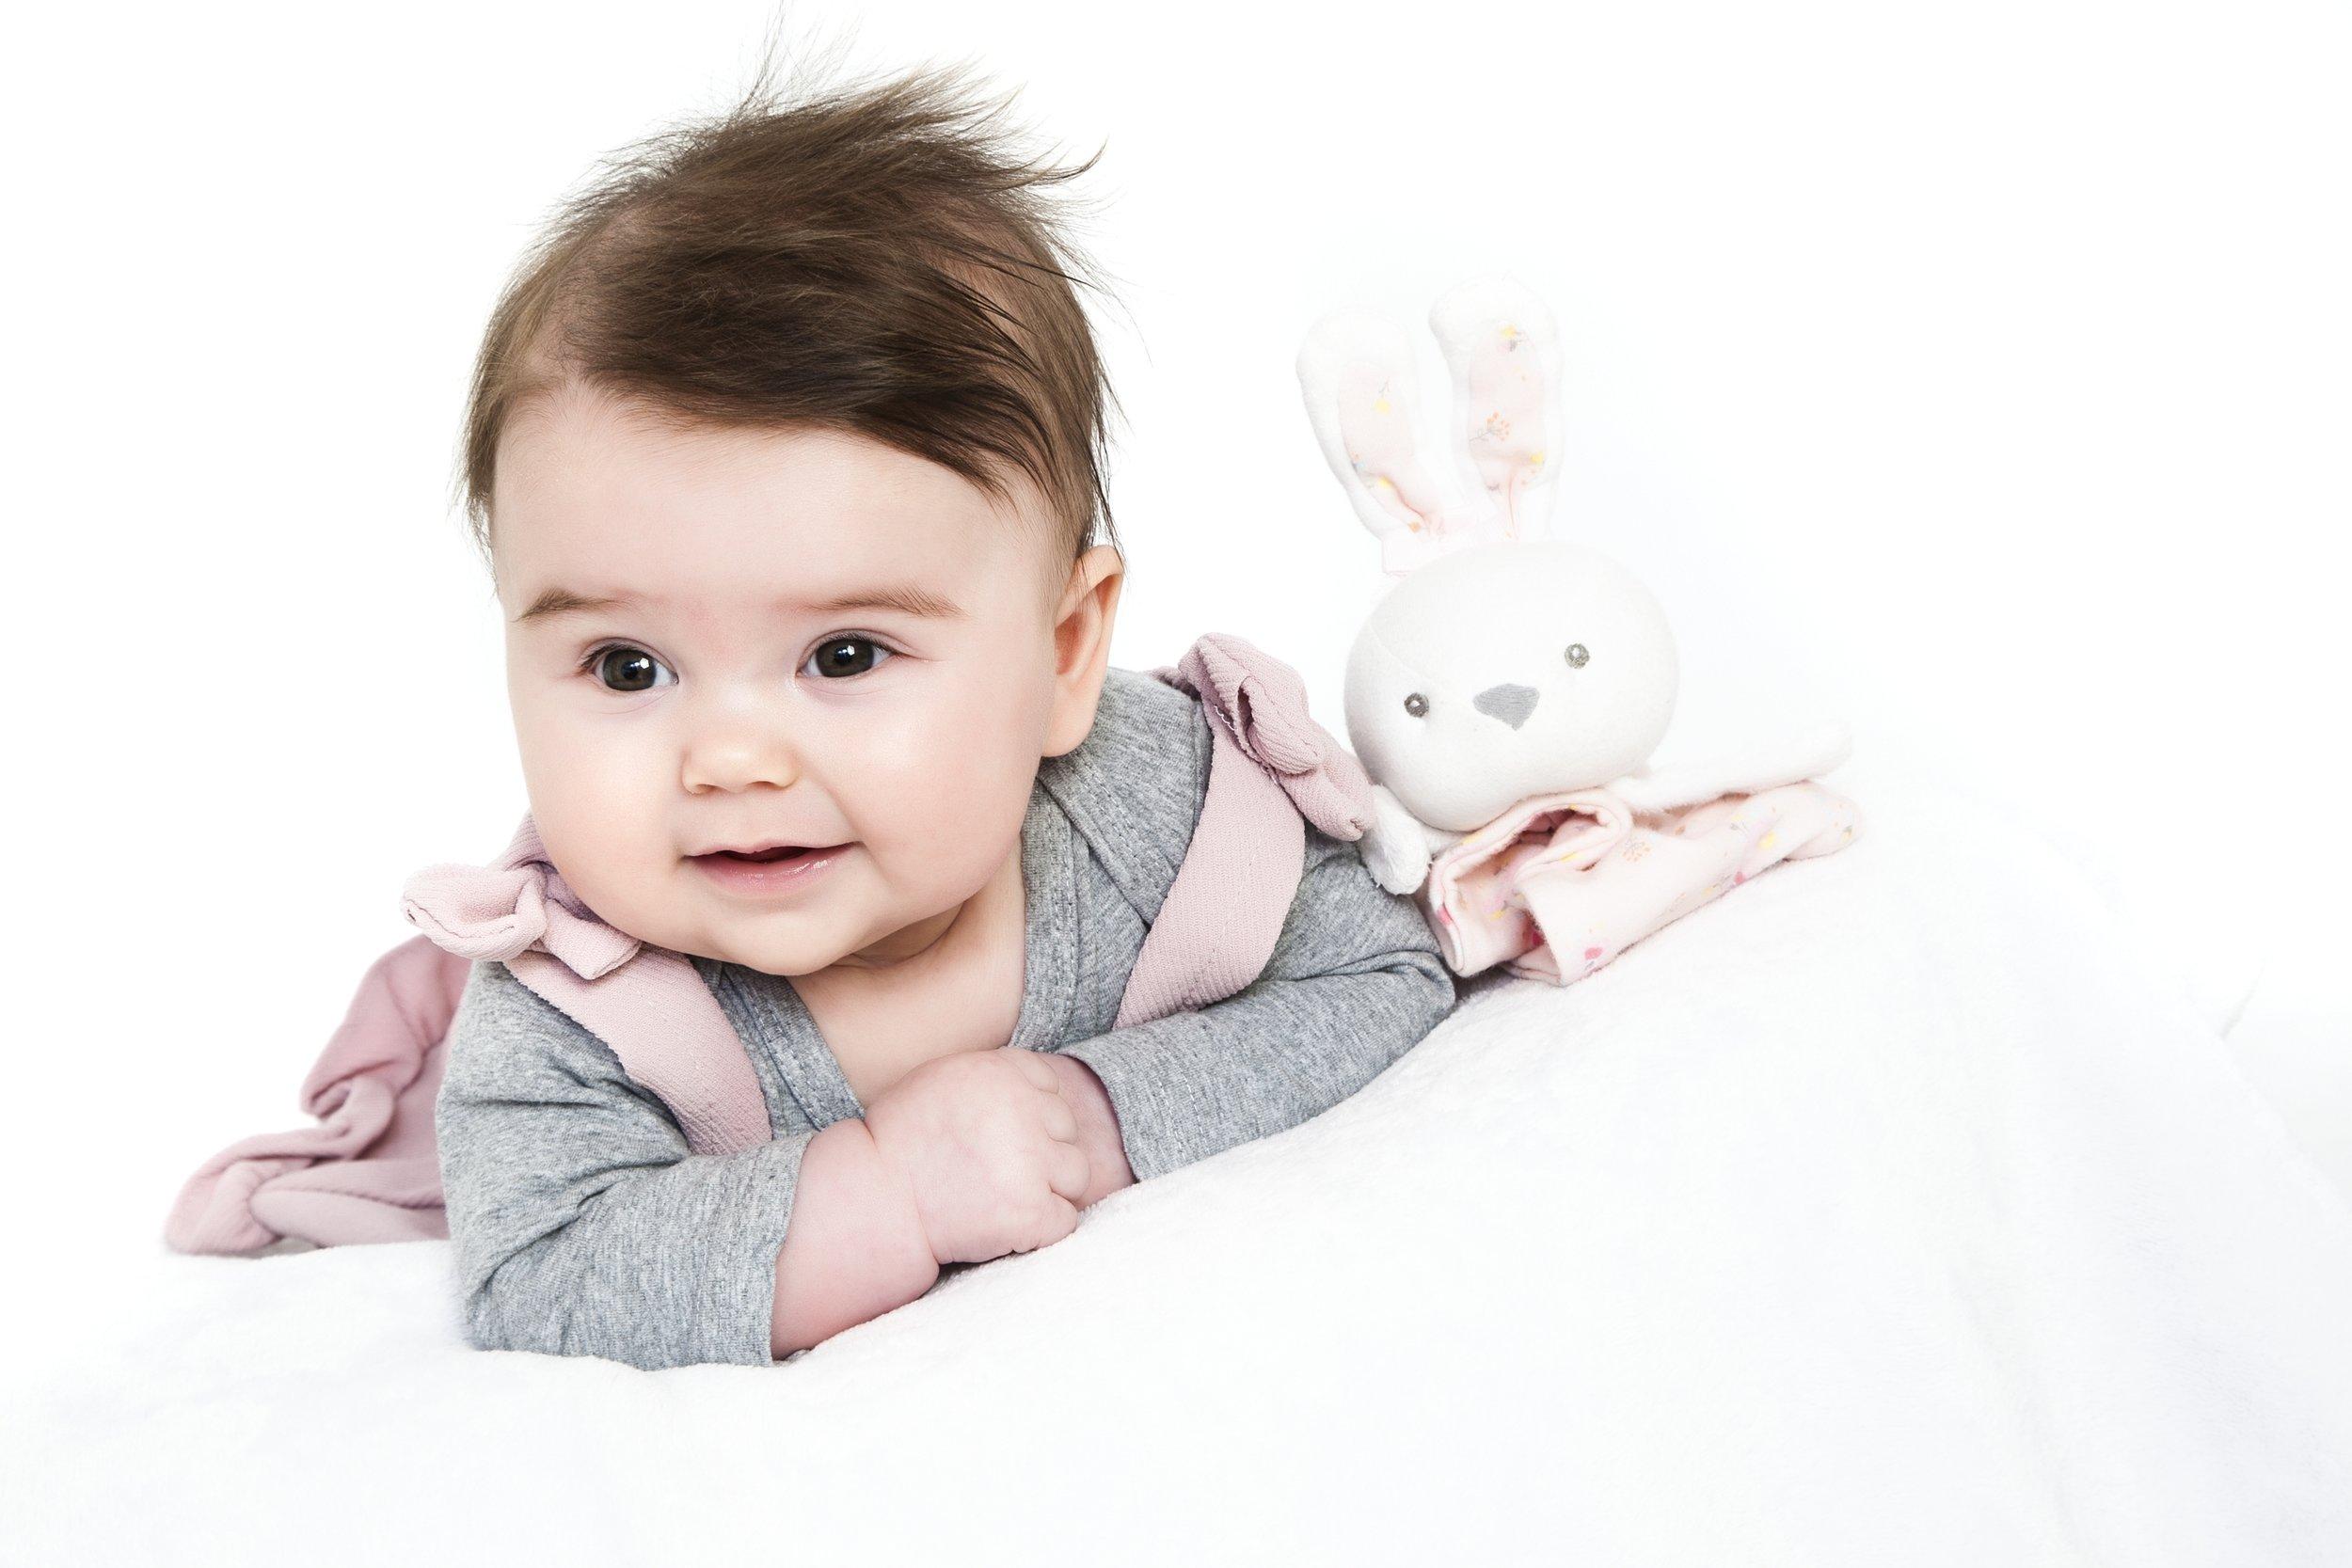 baby-photography-leicester-photographer-photo-shoot-newborn-gift-family-portrait.JPG